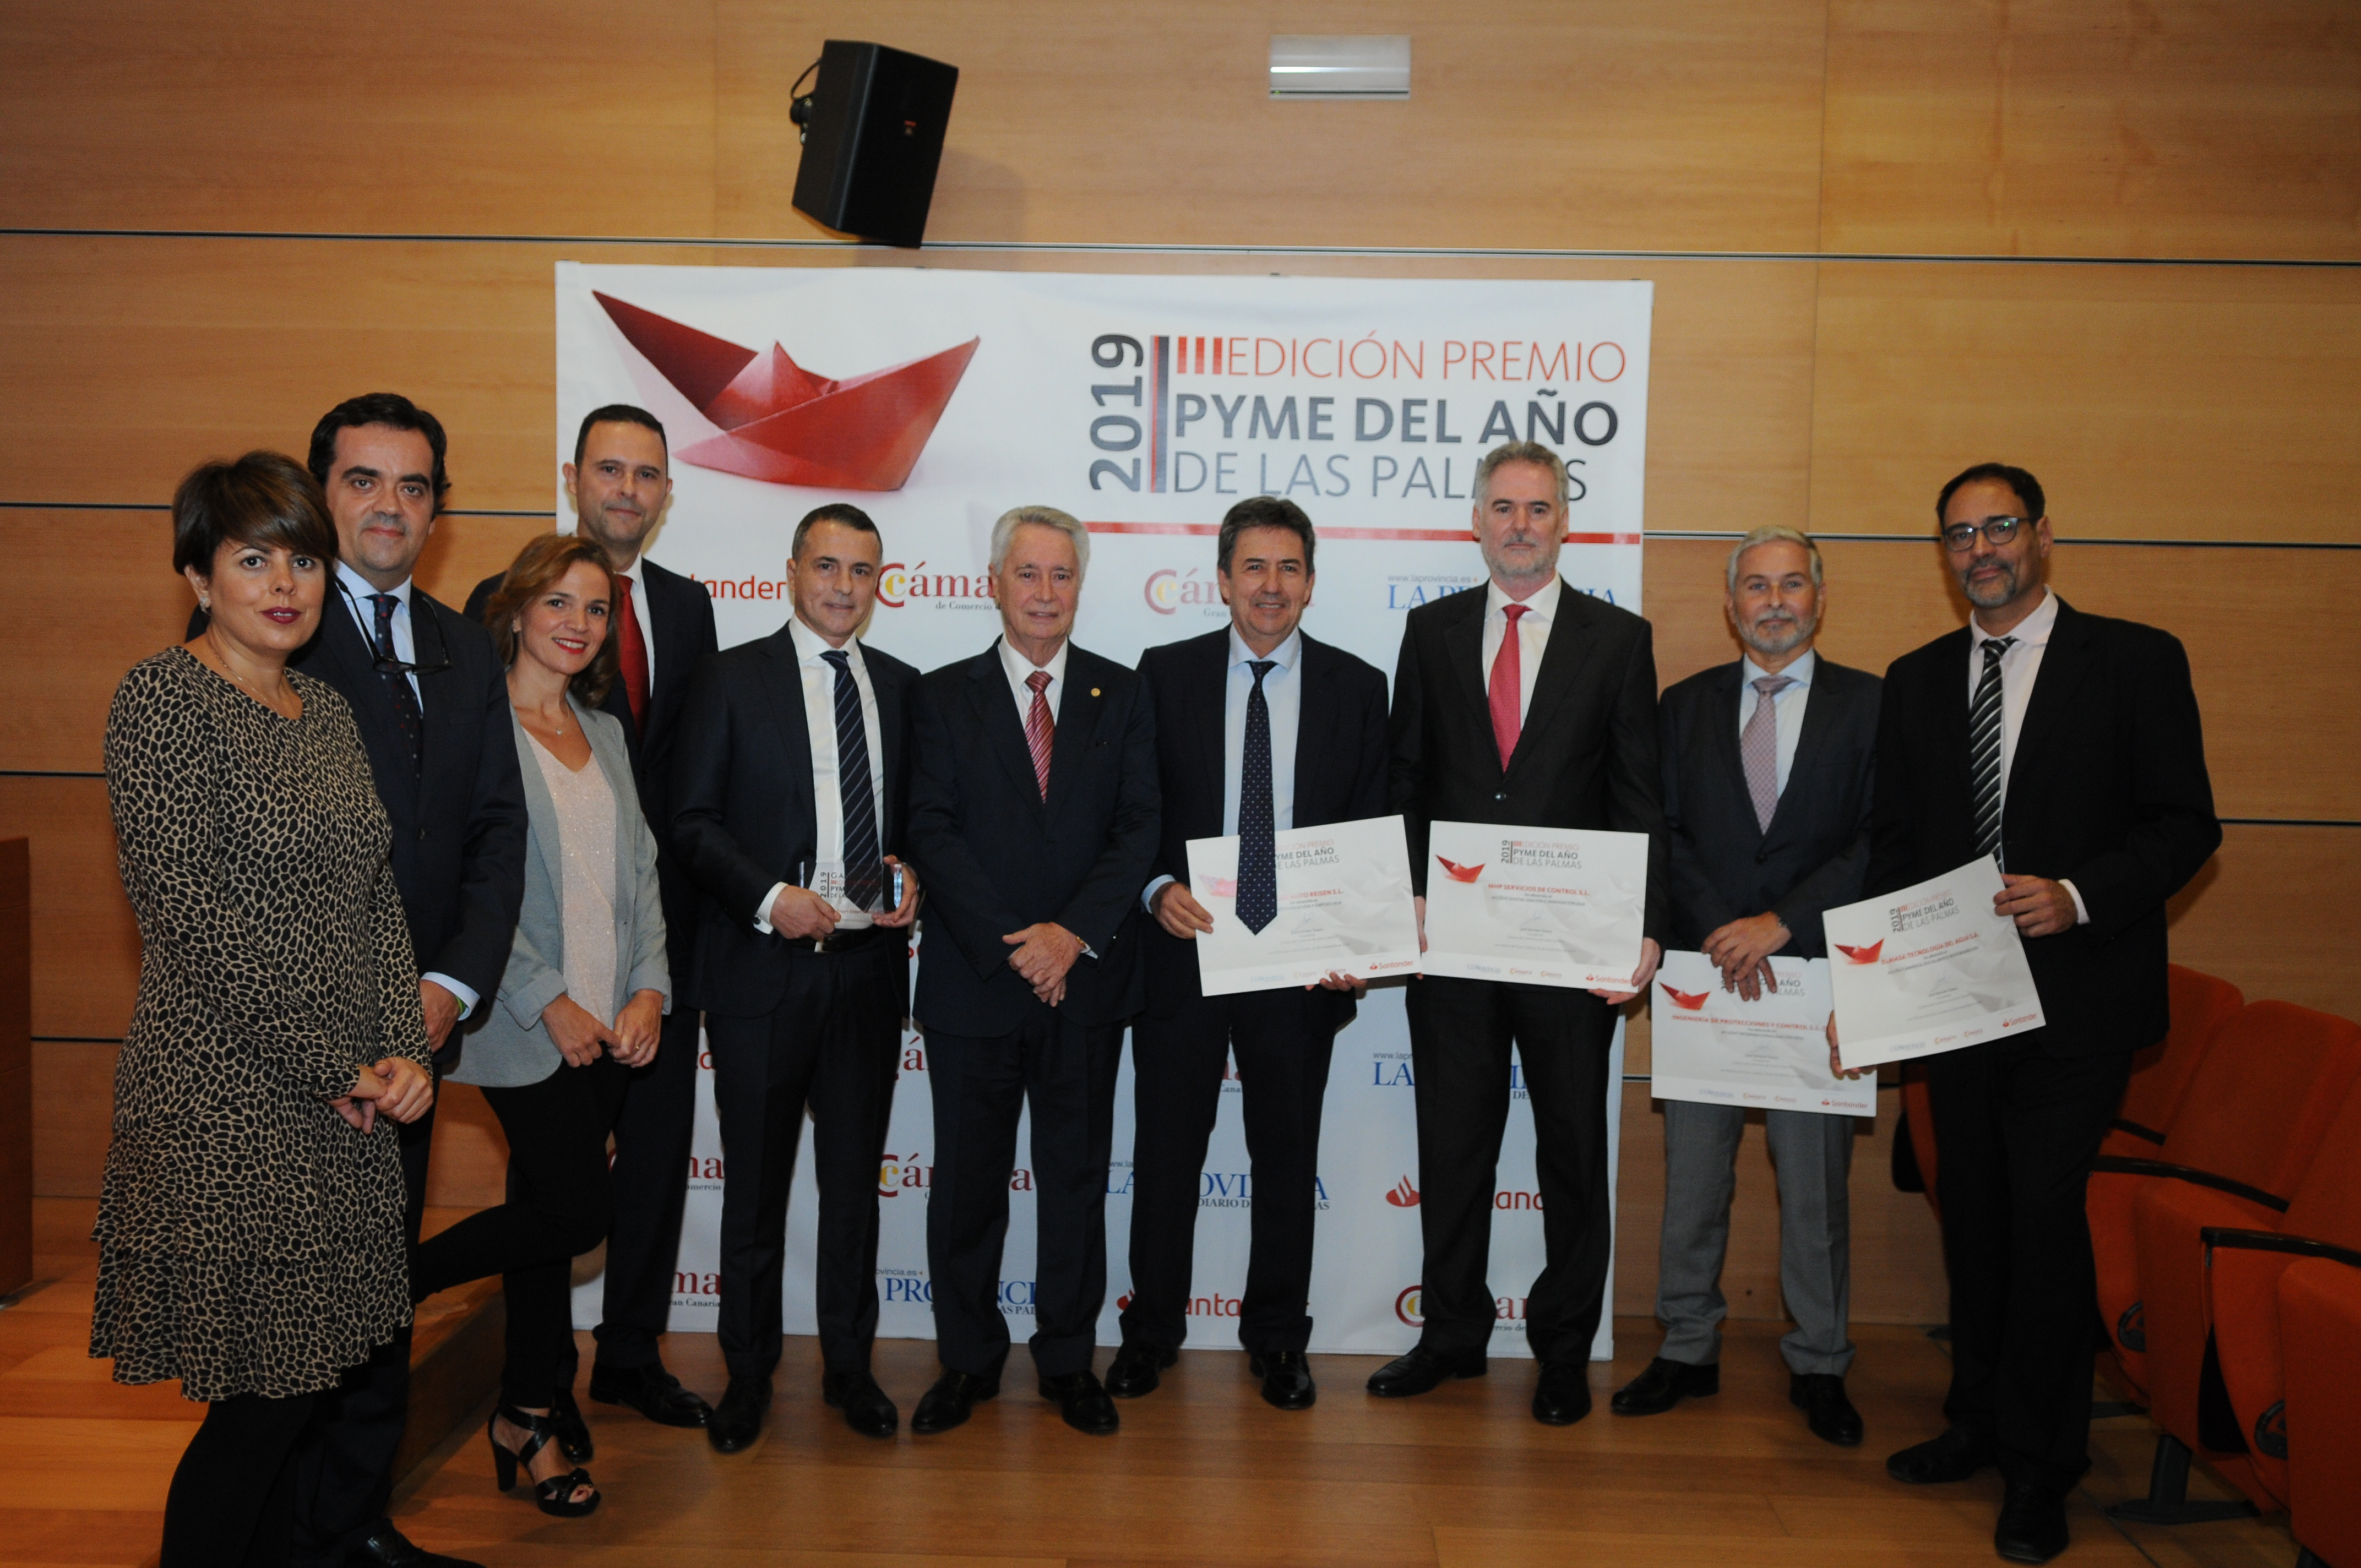 Premio Pyme del año 2019 Las Palmas